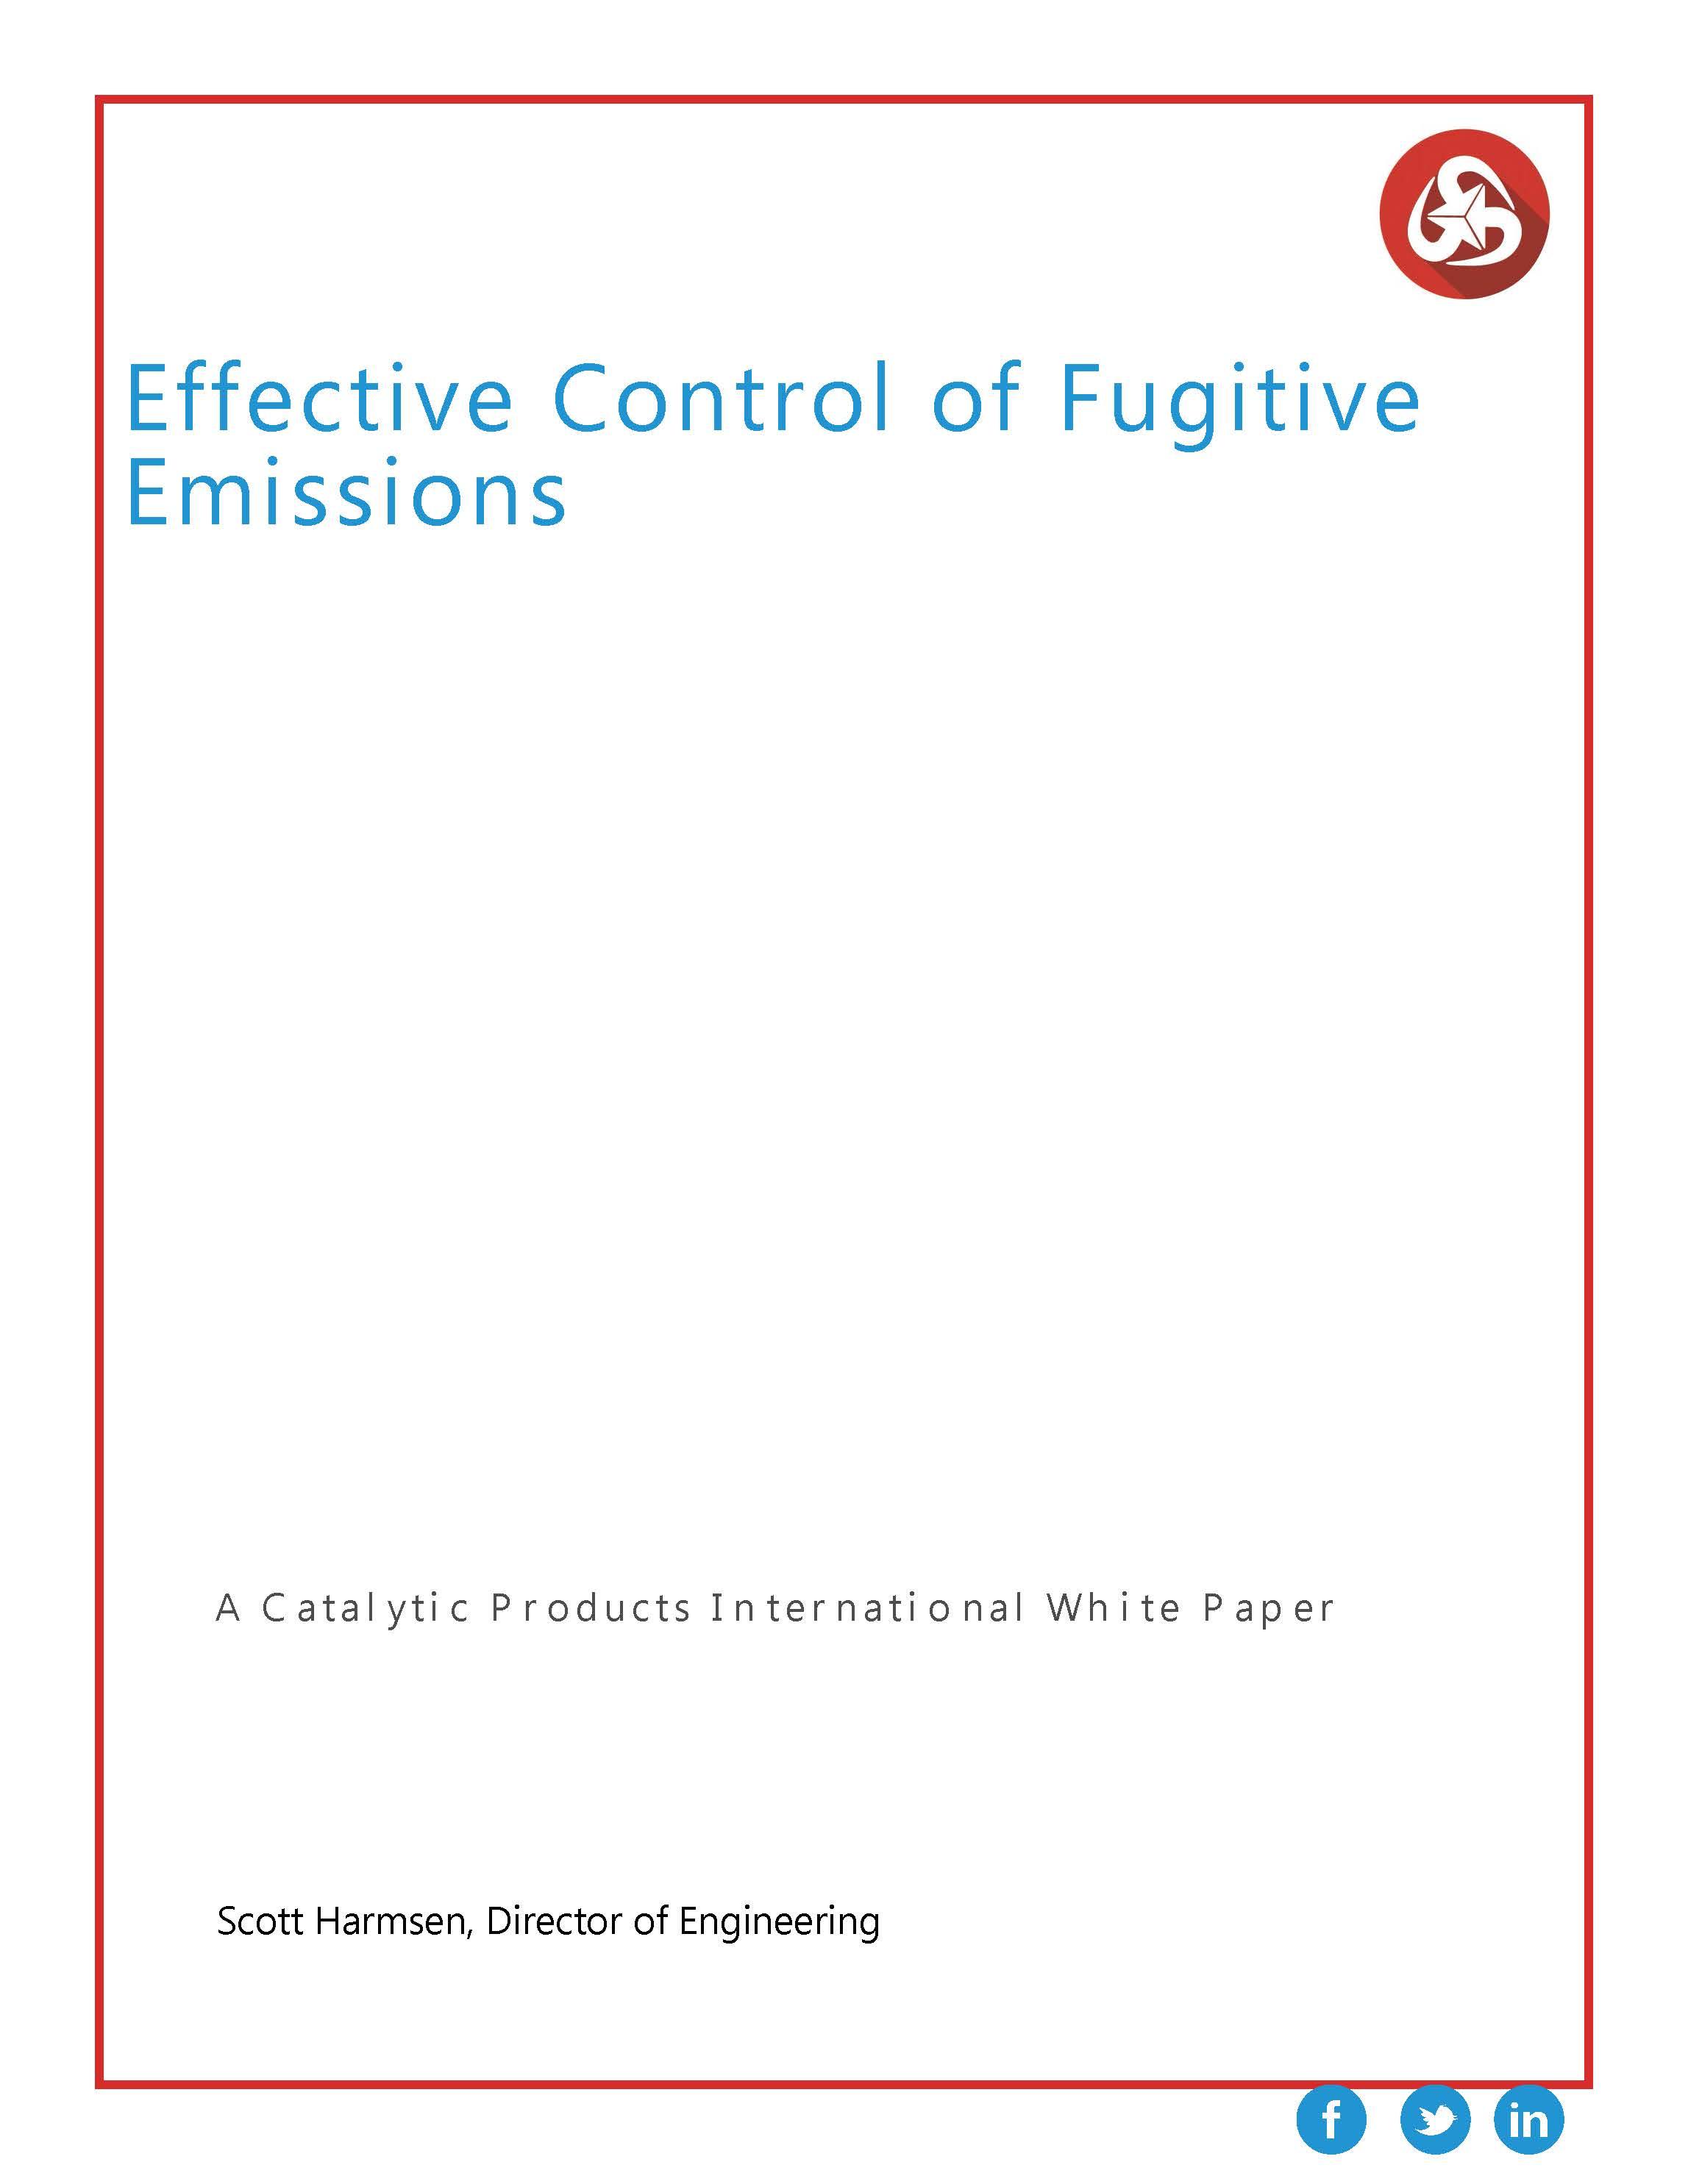 2014_Effective_Control_of_Fugitive_Emissions